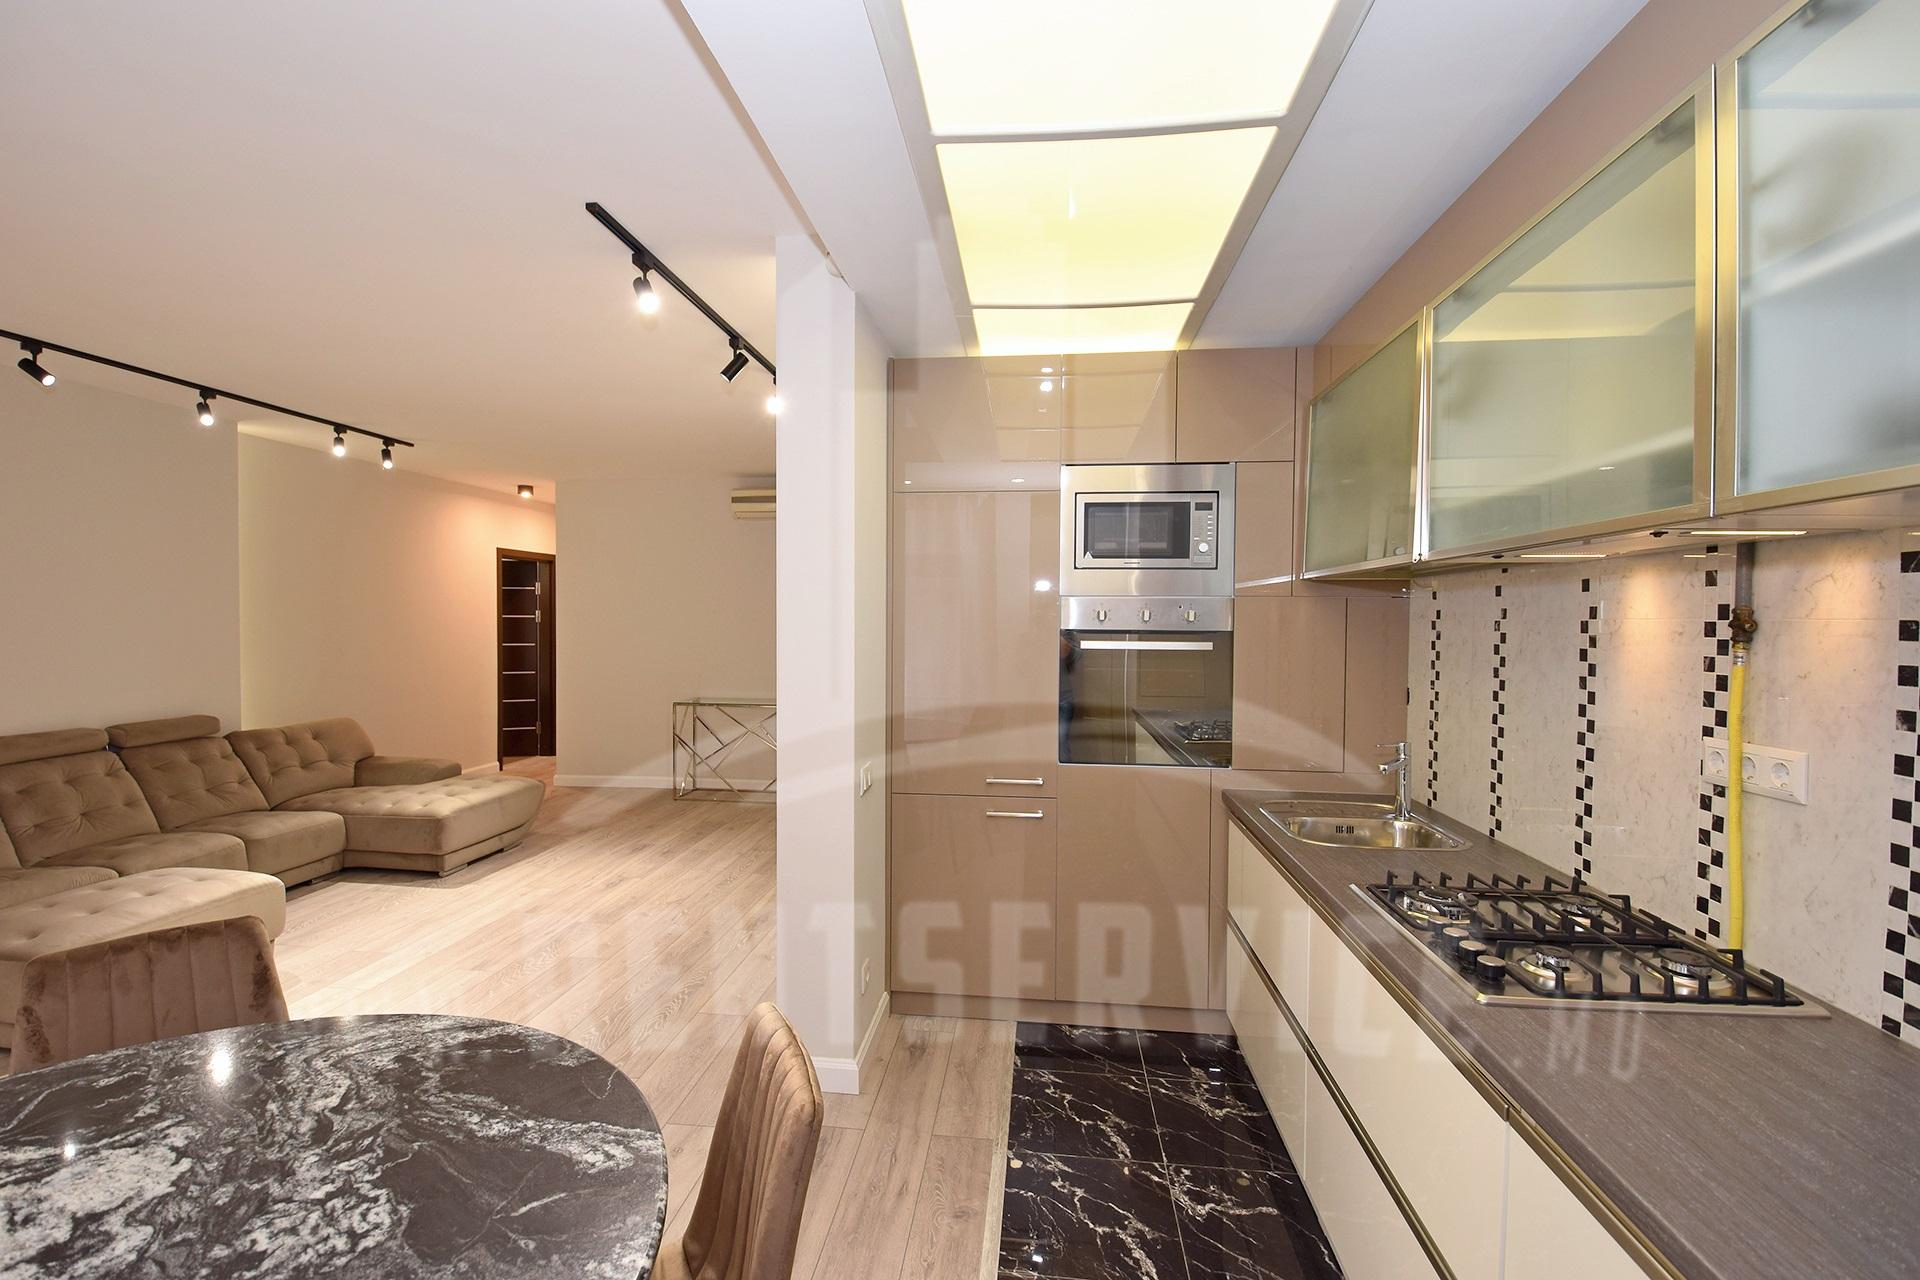 291_apartment_2.JPG